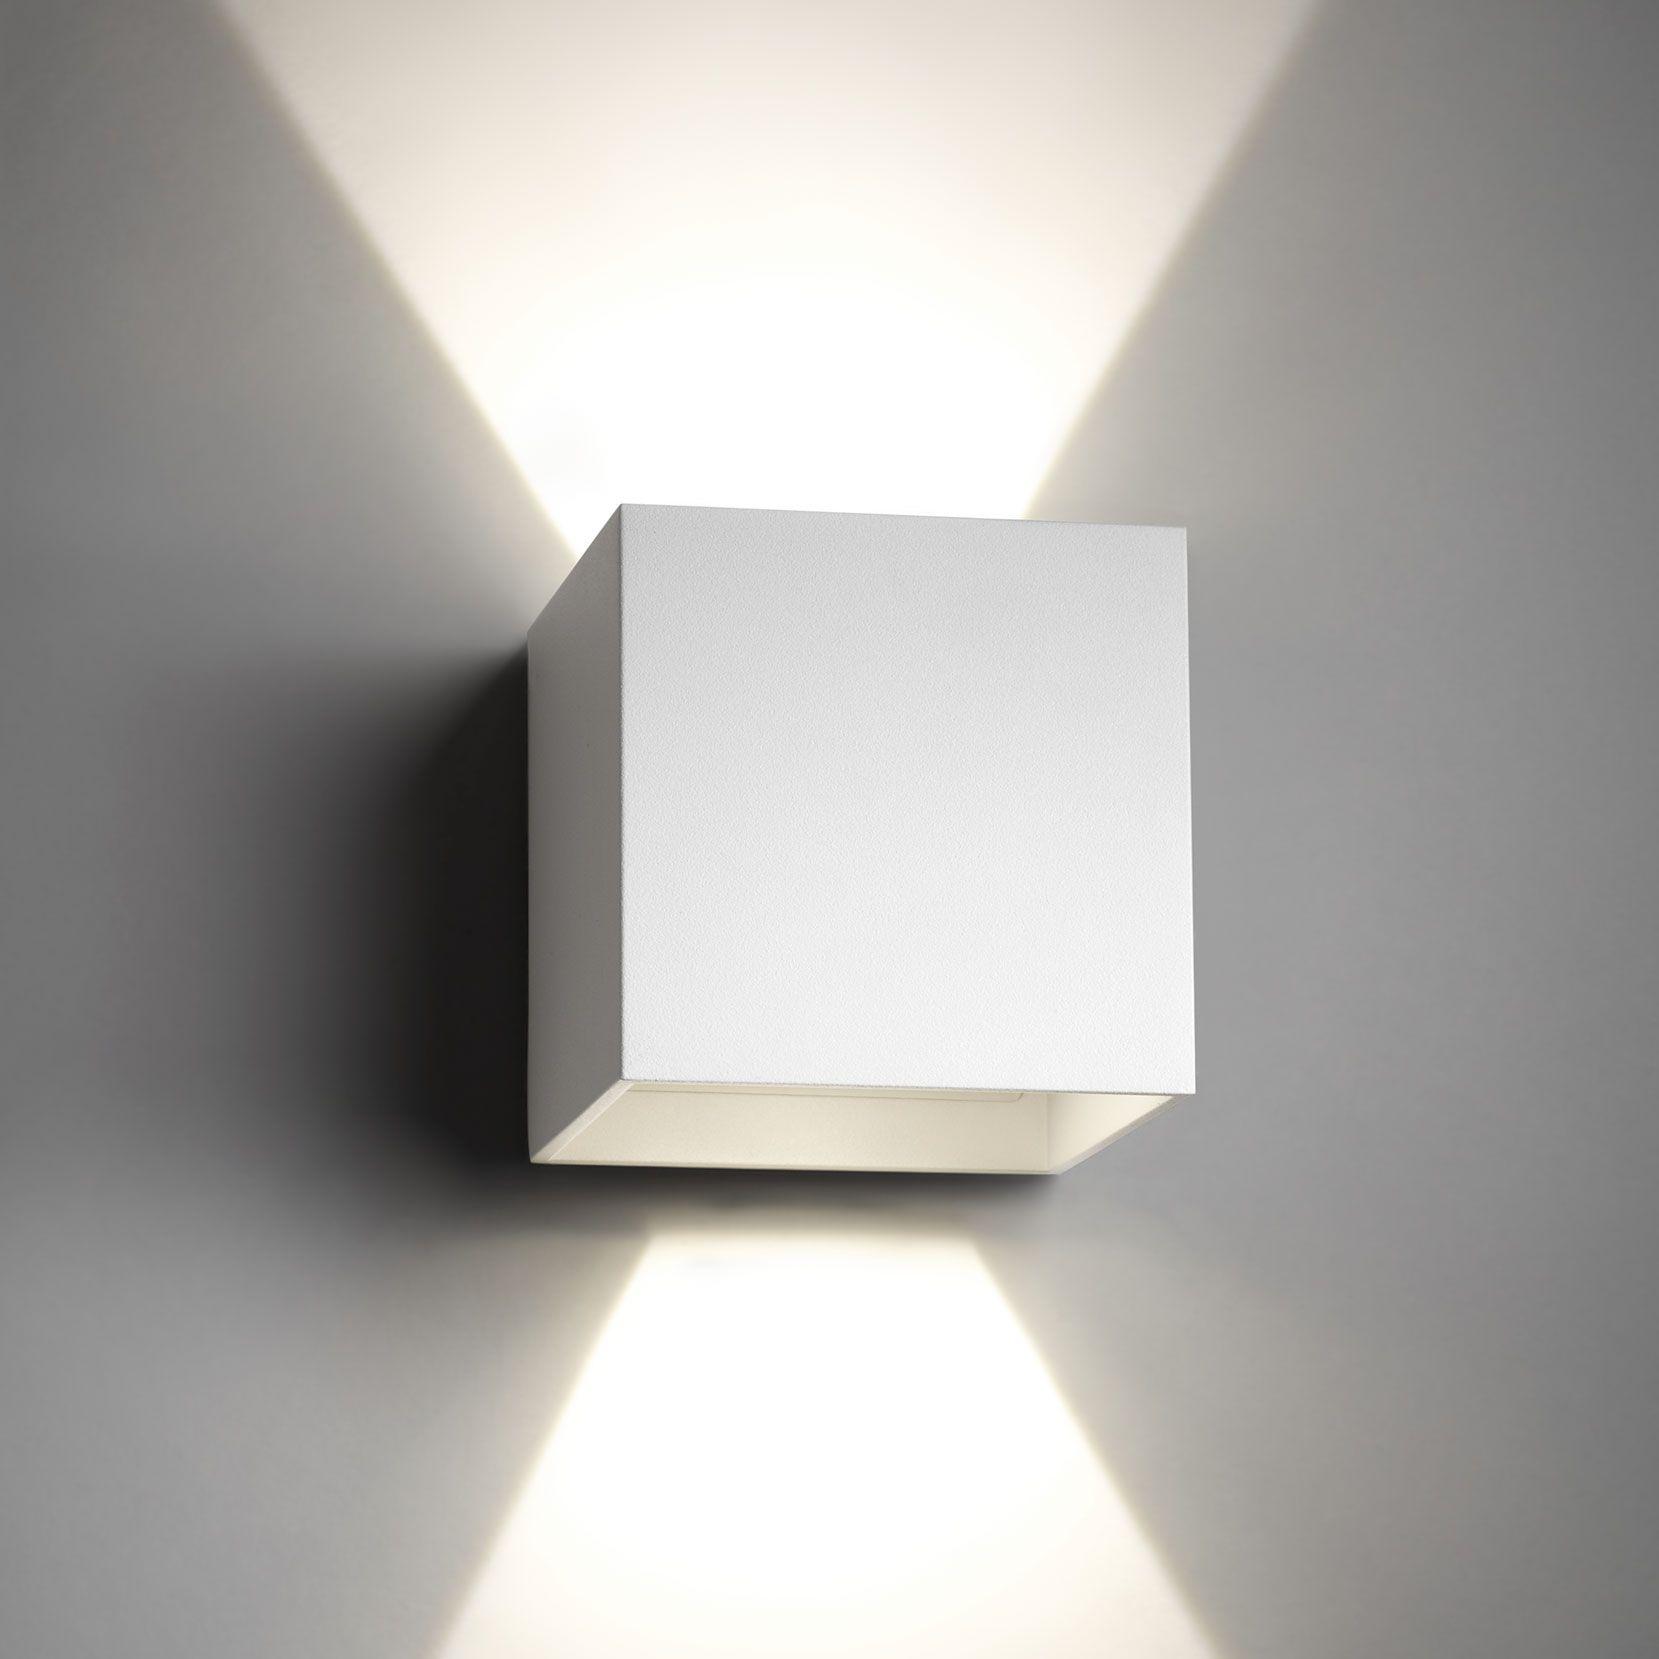 46c631b777453fc310854c30a231a6e9 Faszinierend Up Down Lampe Dekorationen